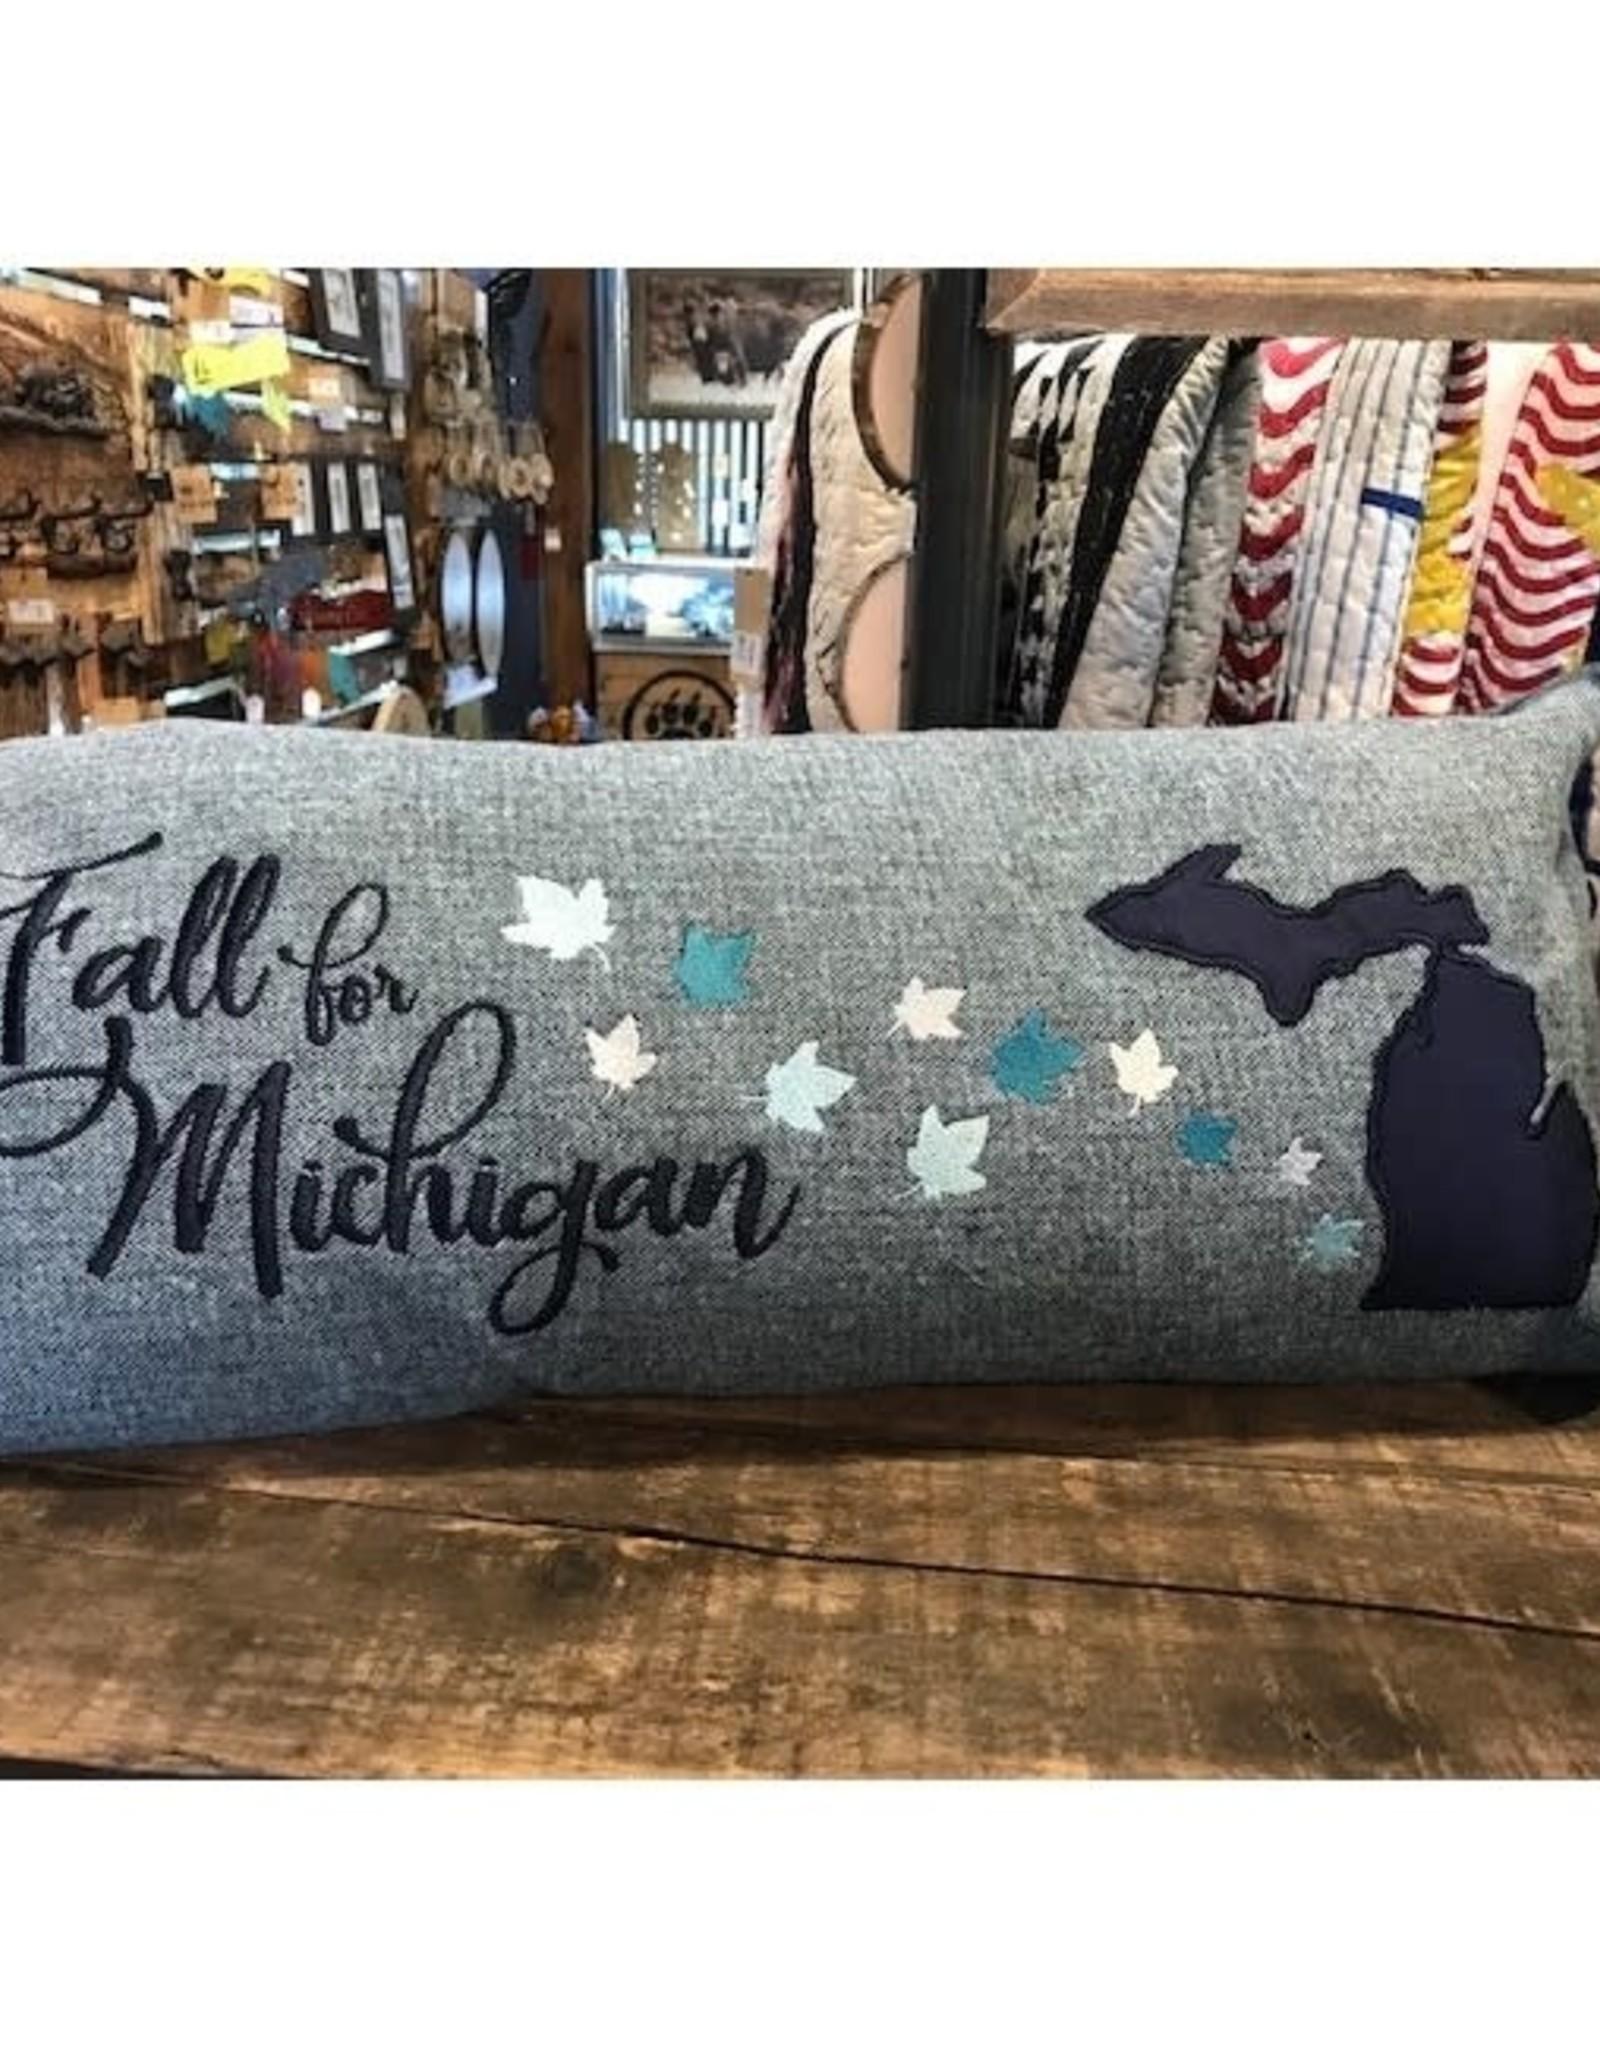 Bear Den Handmade Embroidered Pillow - Fall For MI Blue Shades Edition